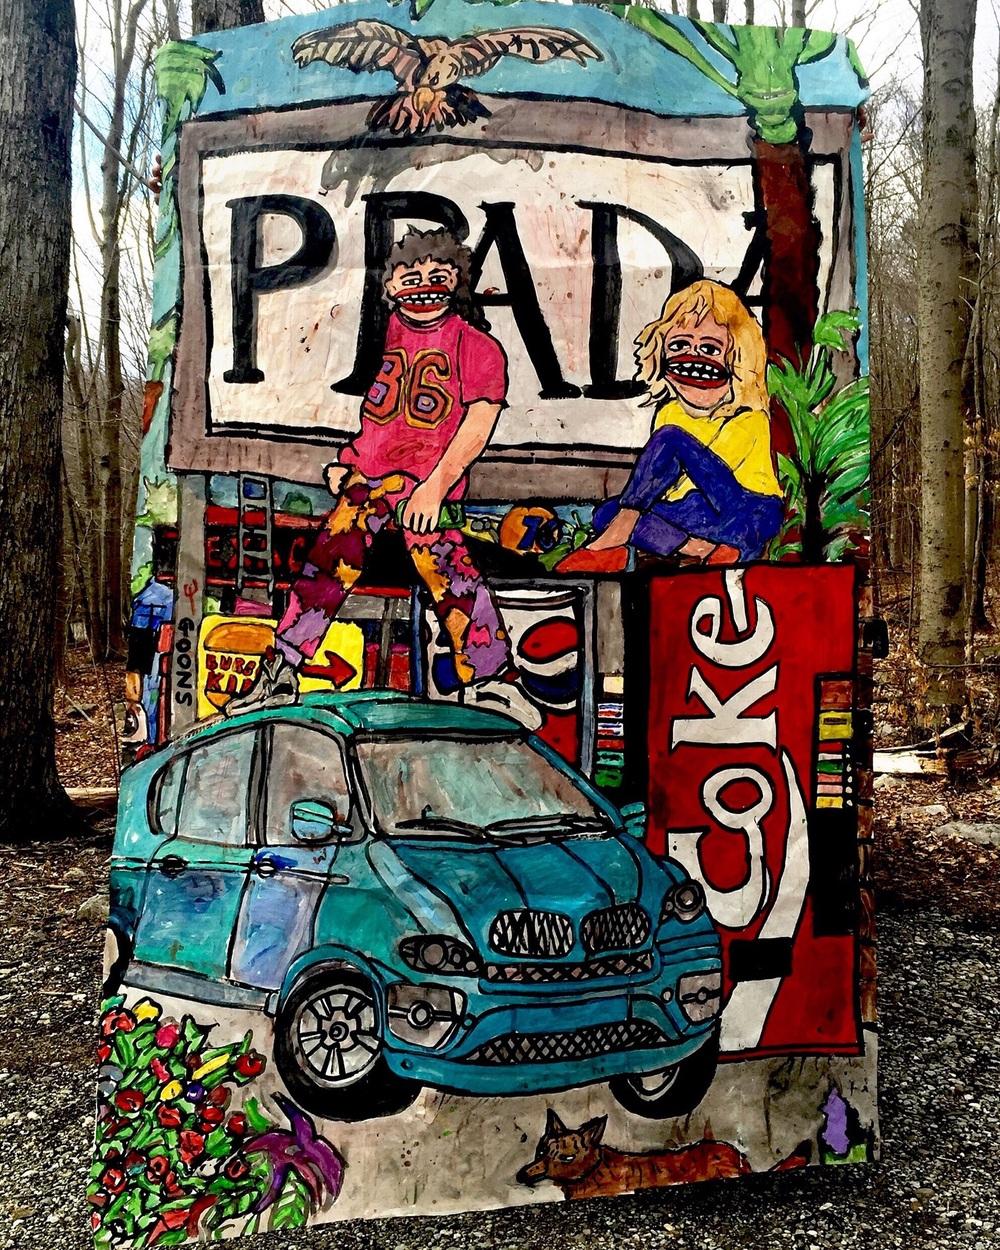 'Prada' $100,000. Sold.